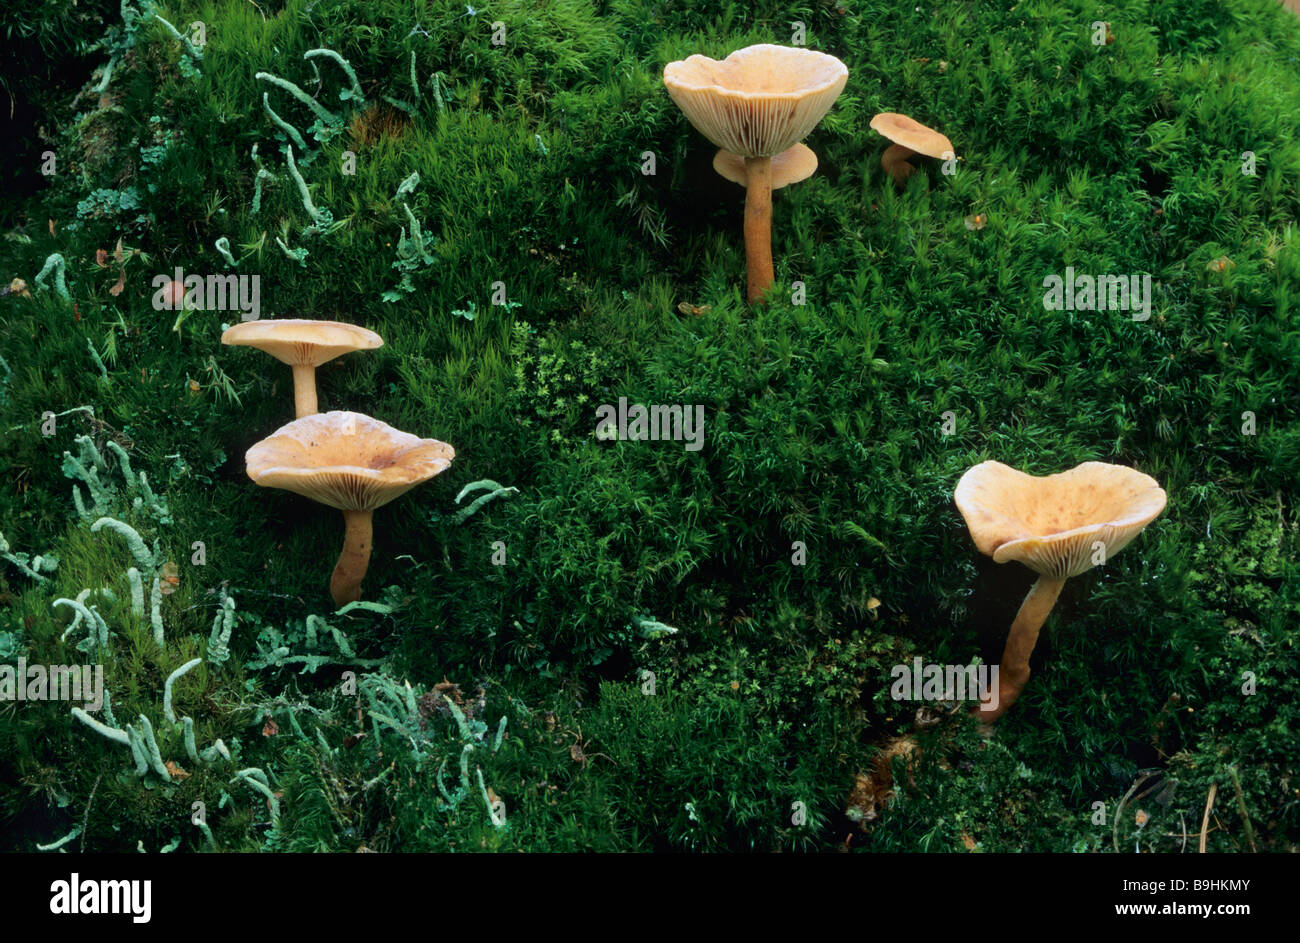 pilze auf moos stockfoto bild 23130939 alamy. Black Bedroom Furniture Sets. Home Design Ideas